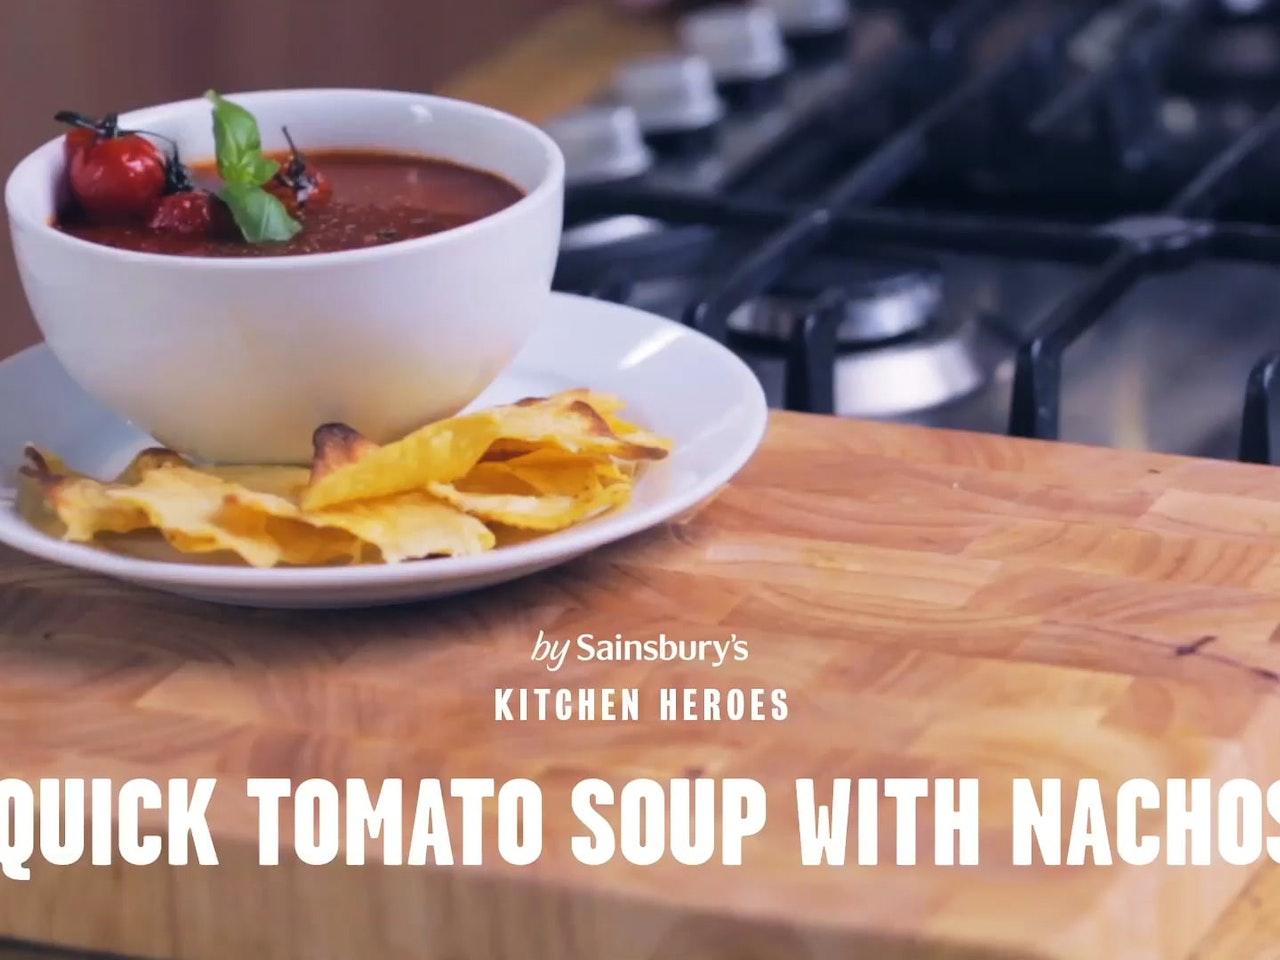 SAINSBURY'S: 'TOMATO SOUP'